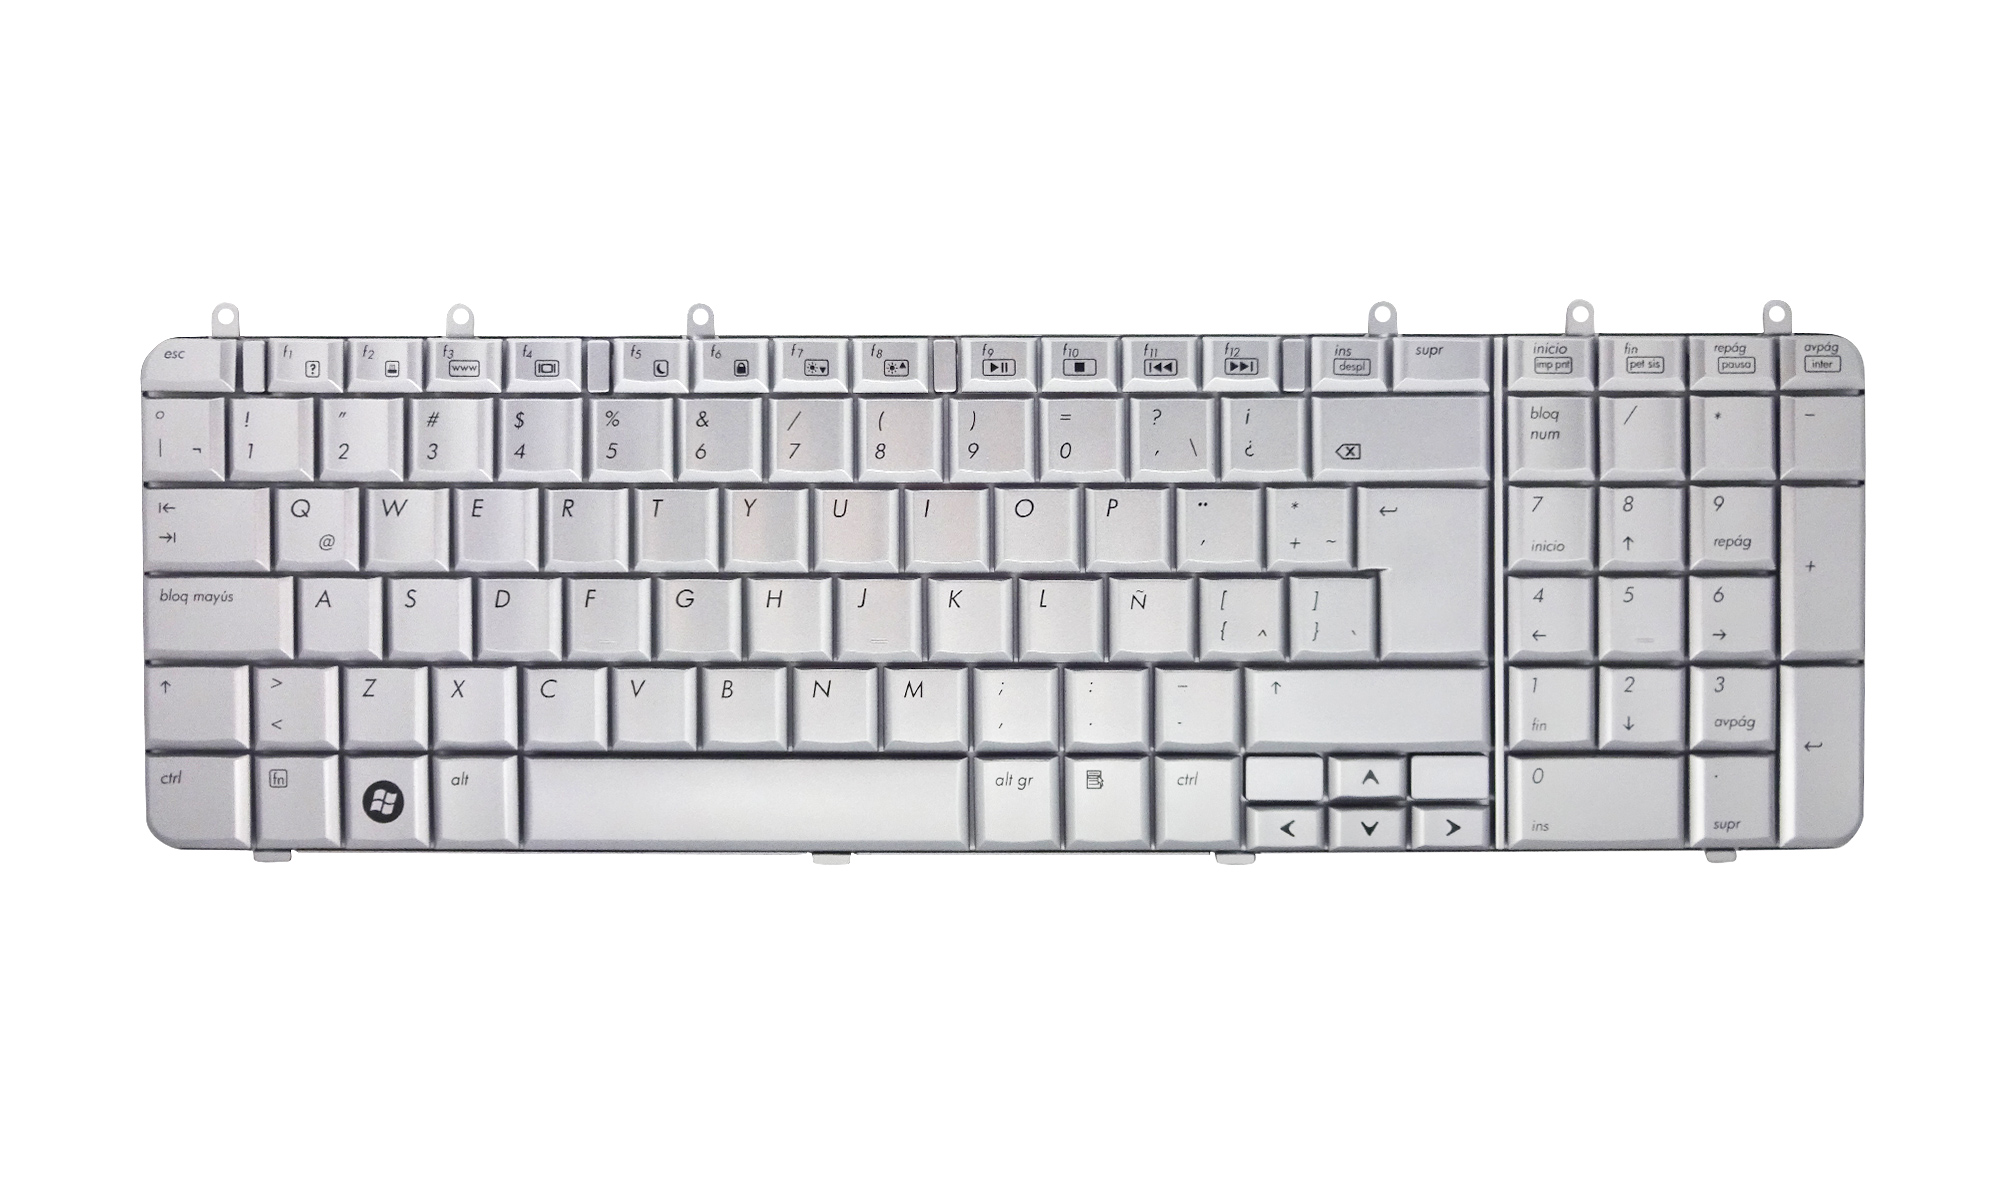 Tastatura compatibila laptop HP Pavilion DV7-1000, DV7-1002, DV7-1004, DV7-1008, DV7-1011, DV7-1017, DV7-1021, DV7-1030, DV7-1040, DV7-1050, DV7-1060, DV7-1070, DV7-1080, DV7-1090, argintie, layout spaniol